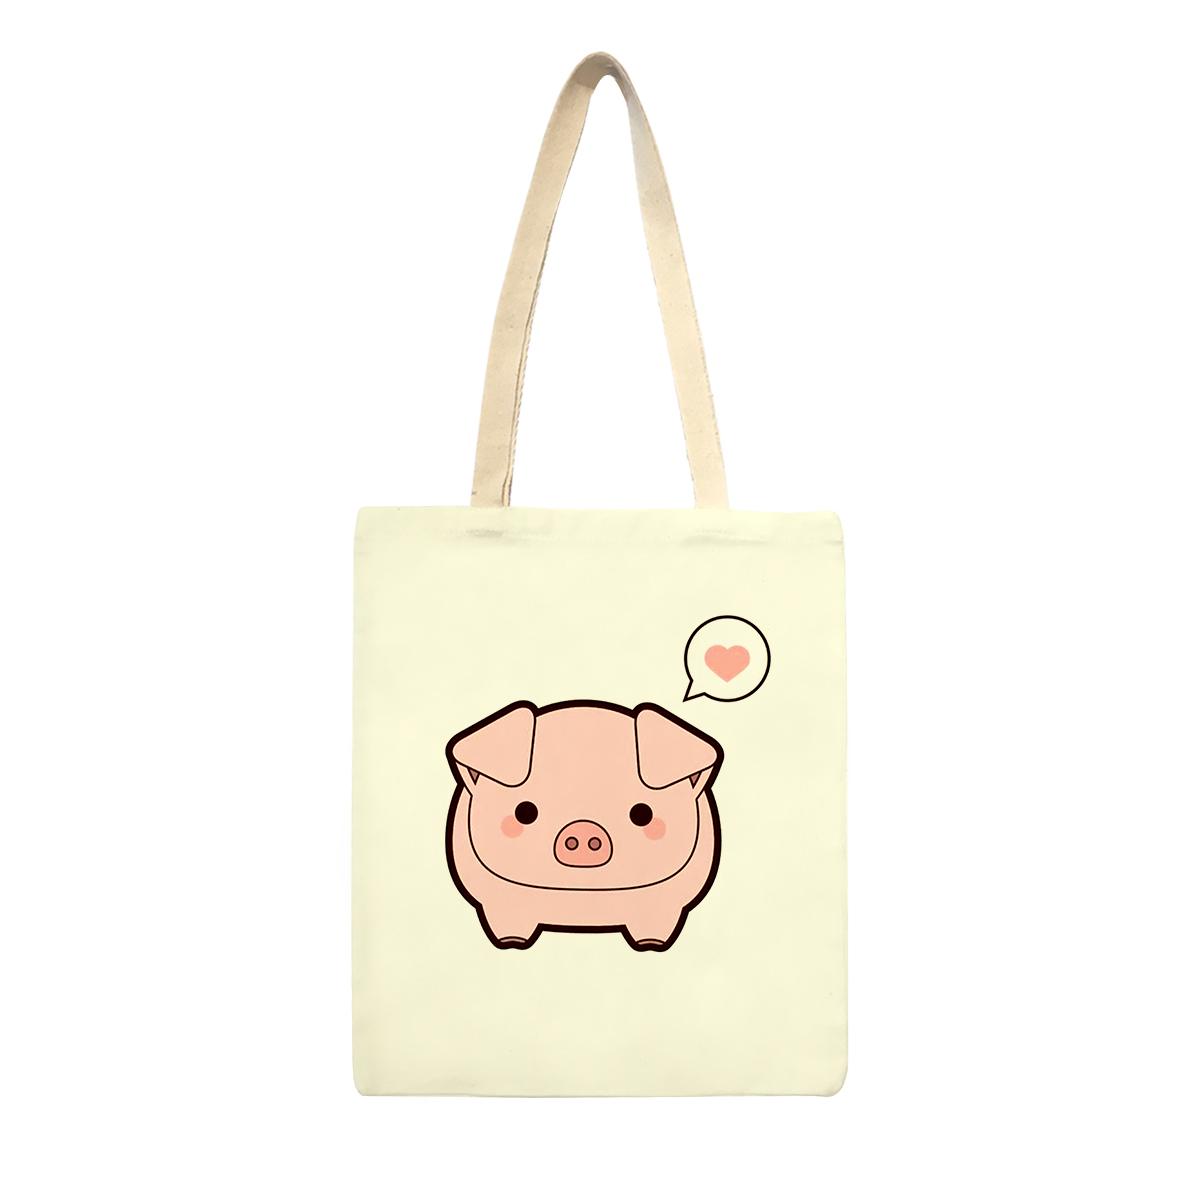 ساک خرید طرح عروسک خوک و قلب کد sk34